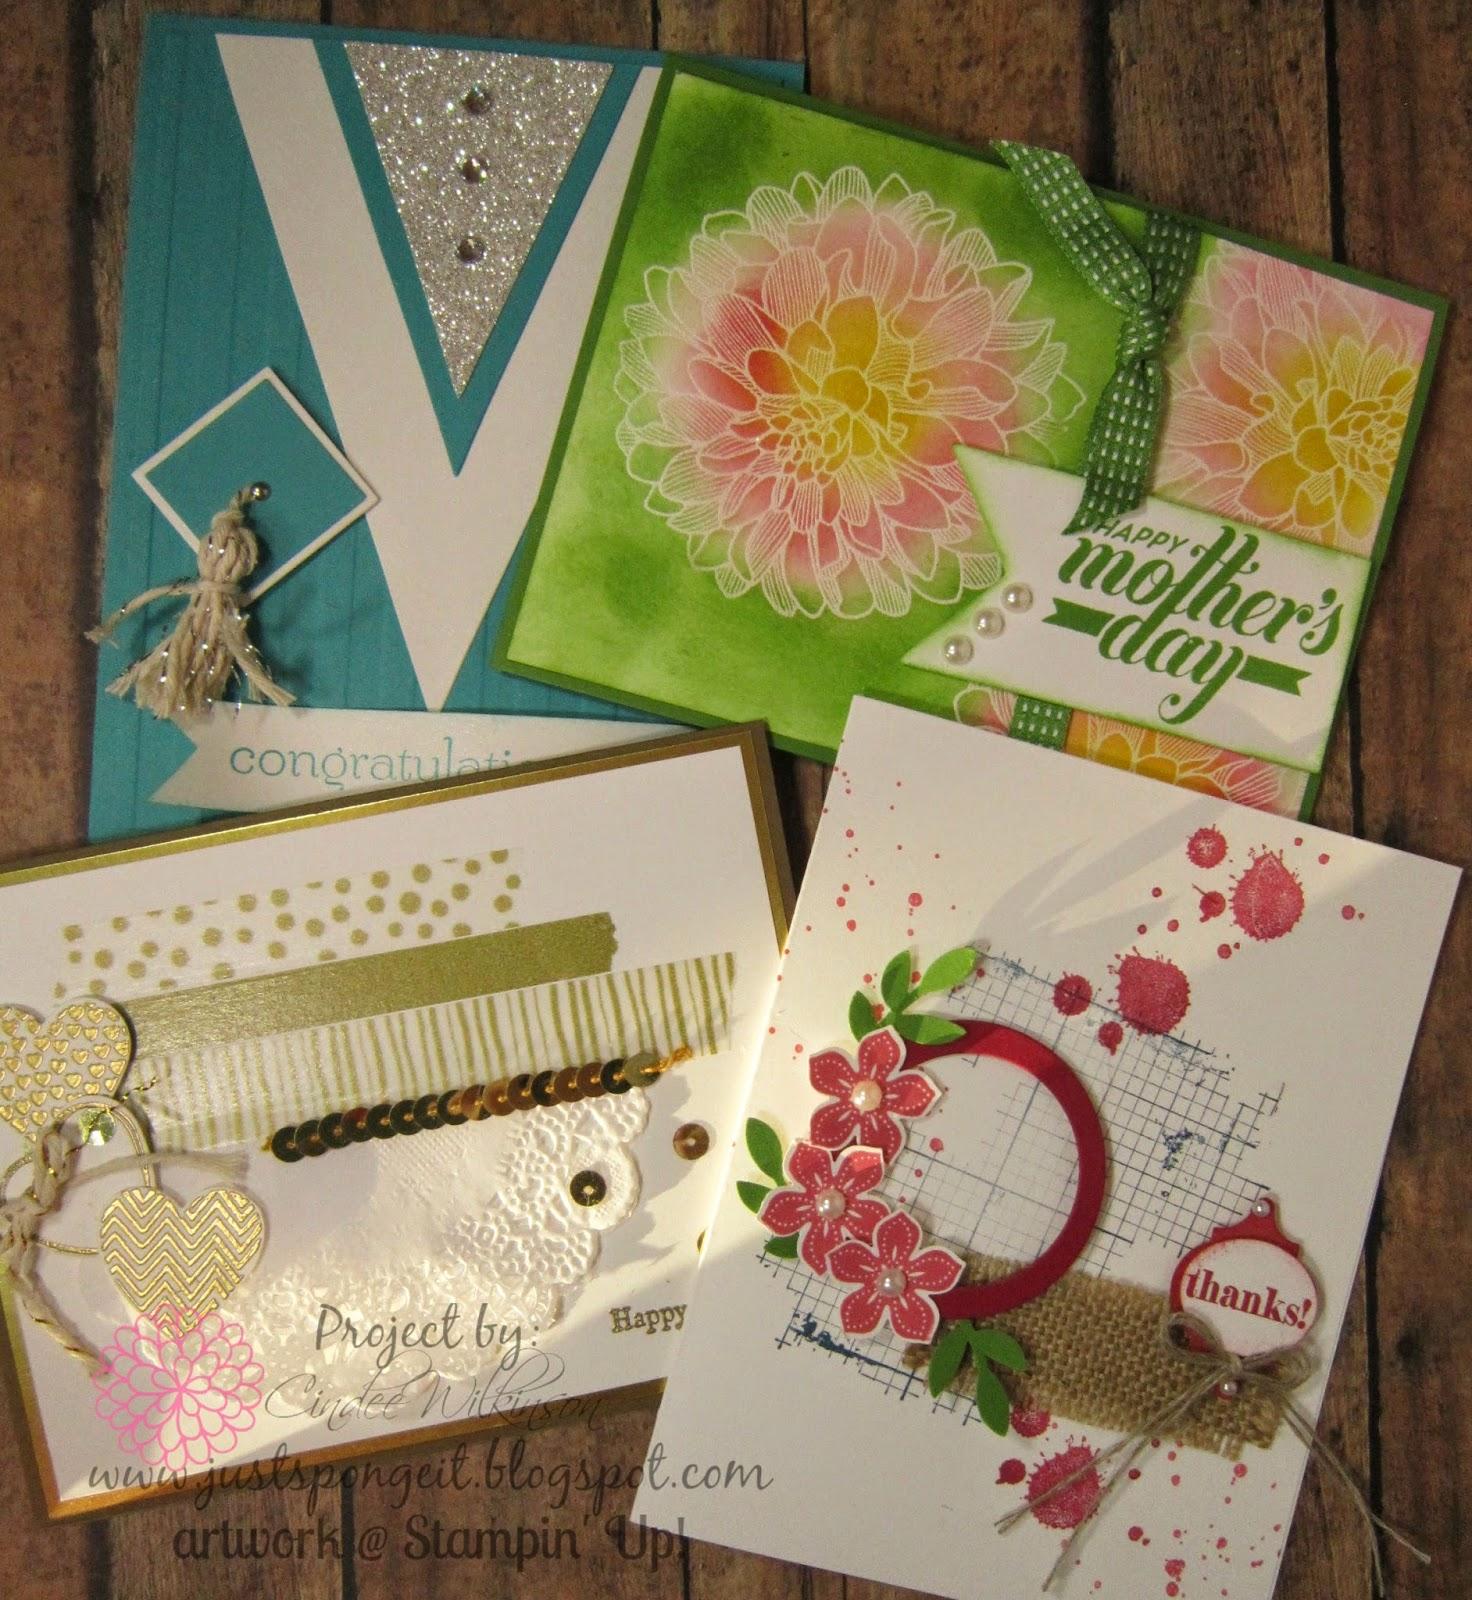 Stamp Club Cards! Hearts a Flutter! – Just Sponge It!